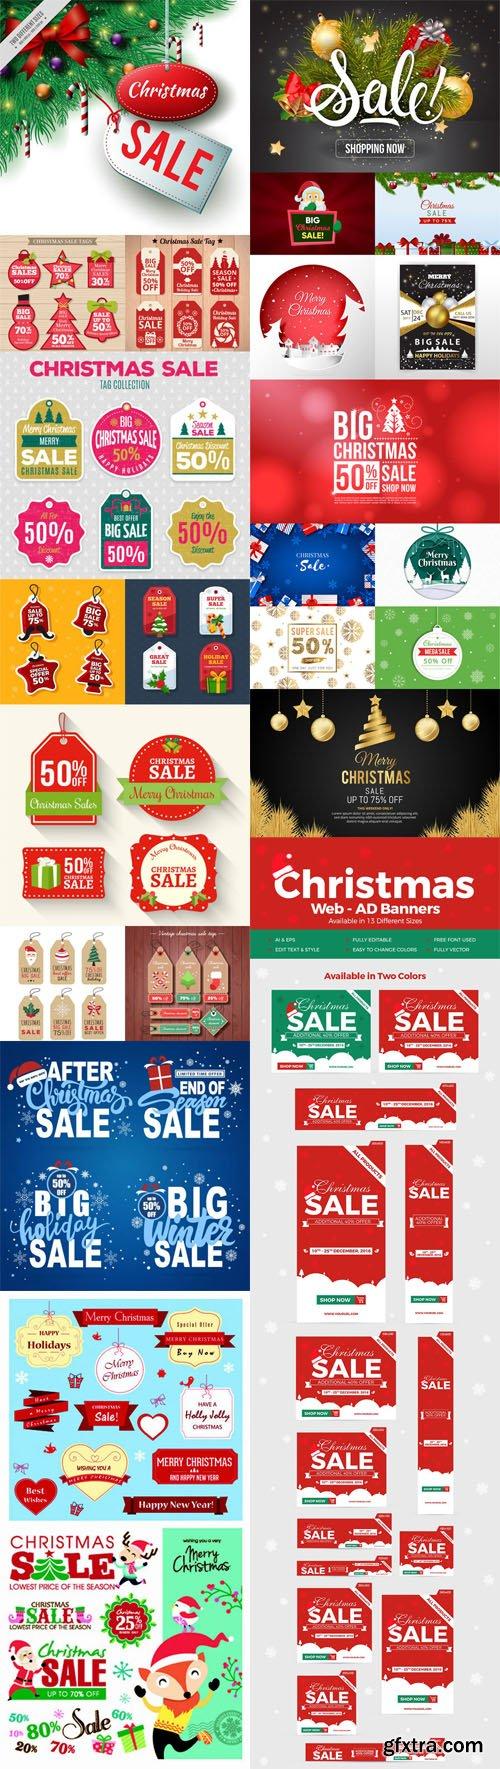 Holiday & Christmas Sales Vector Bundle 3